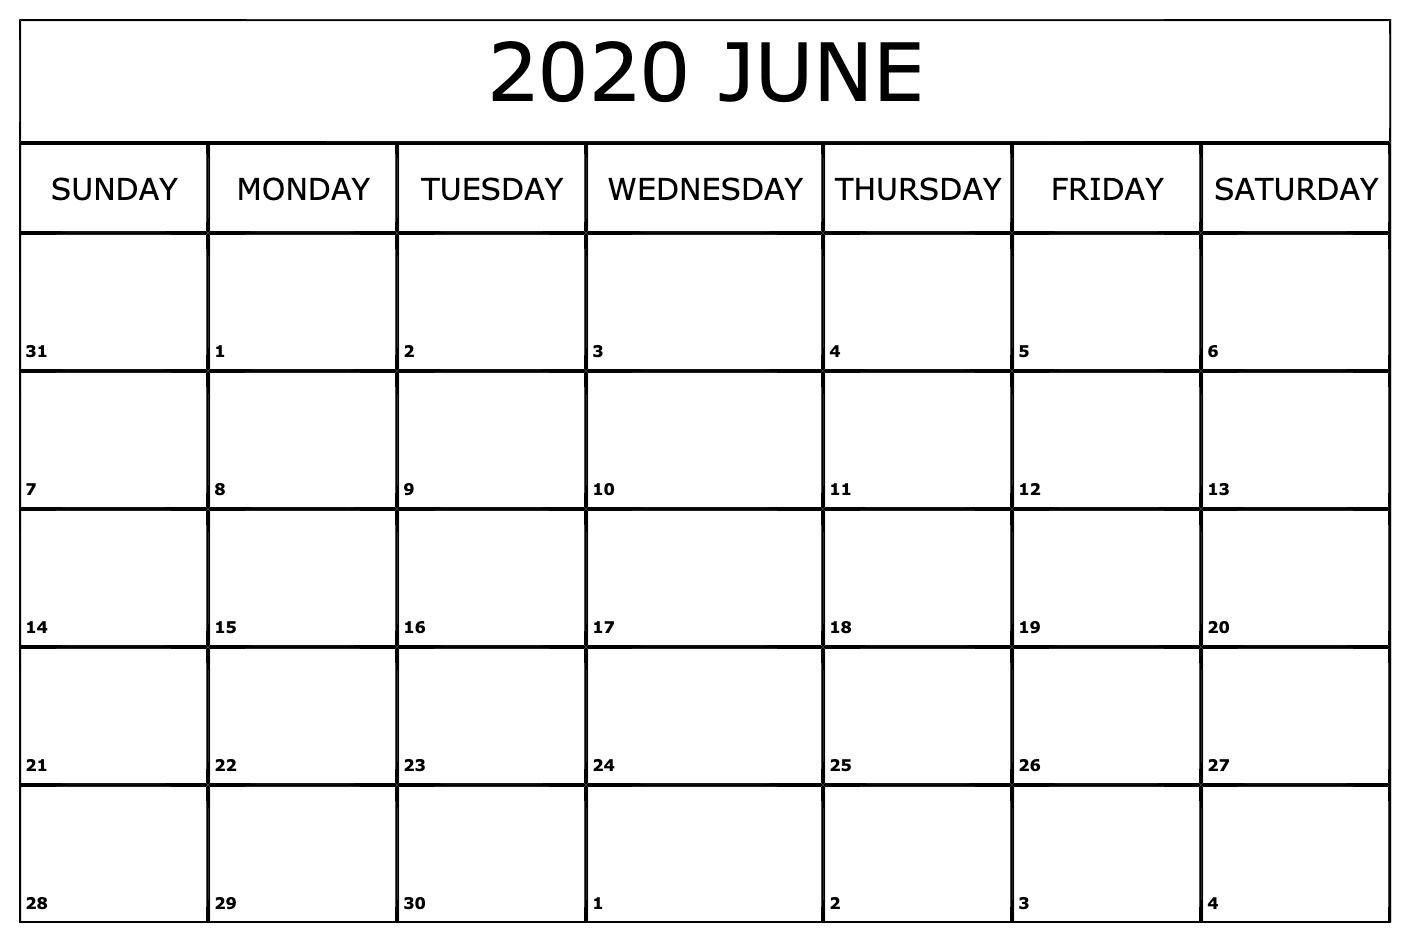 June 2020 US Calendar Holidays